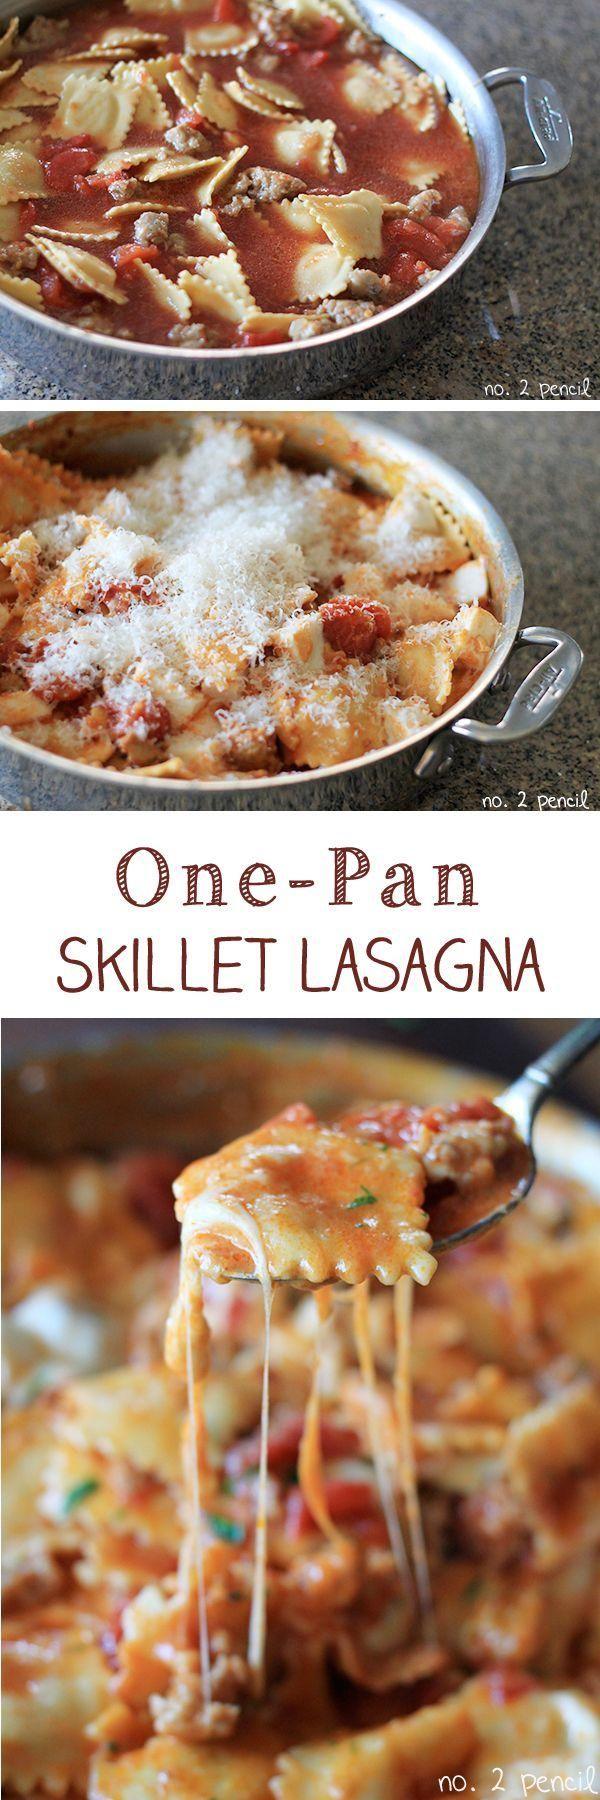 One-pan skillet lasagne made with ravioli